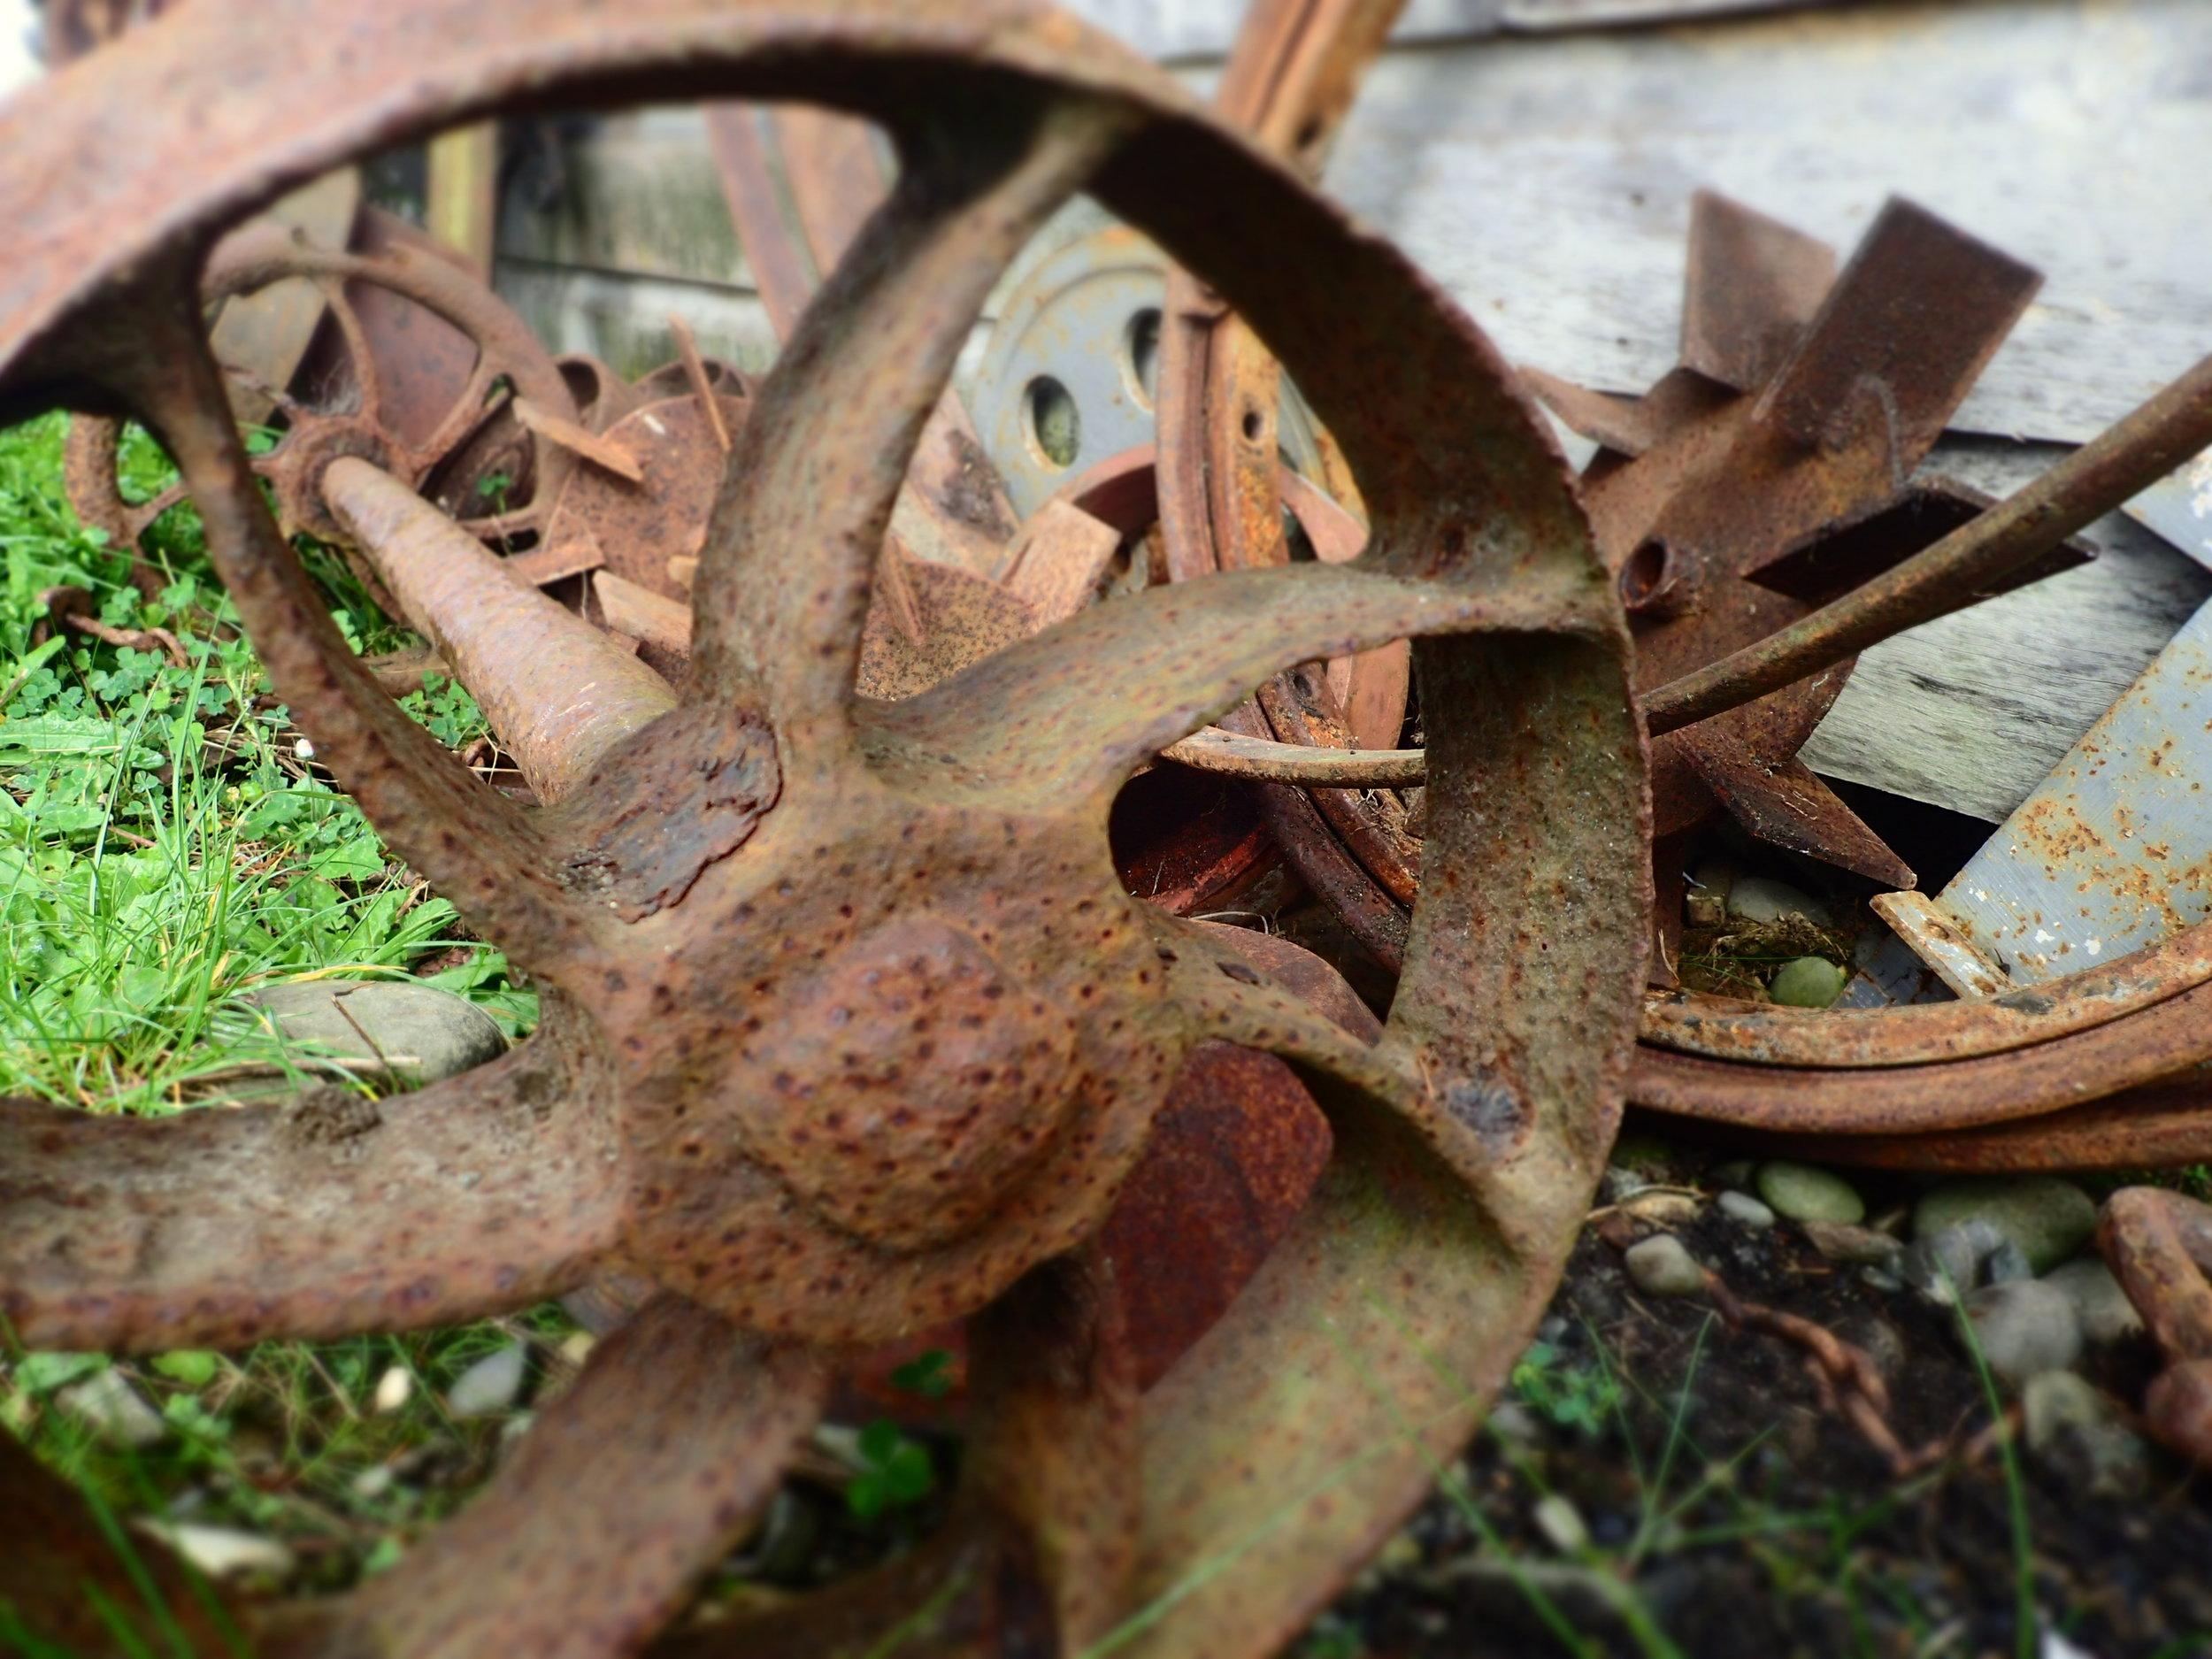 Old mining buggy tram wheels.